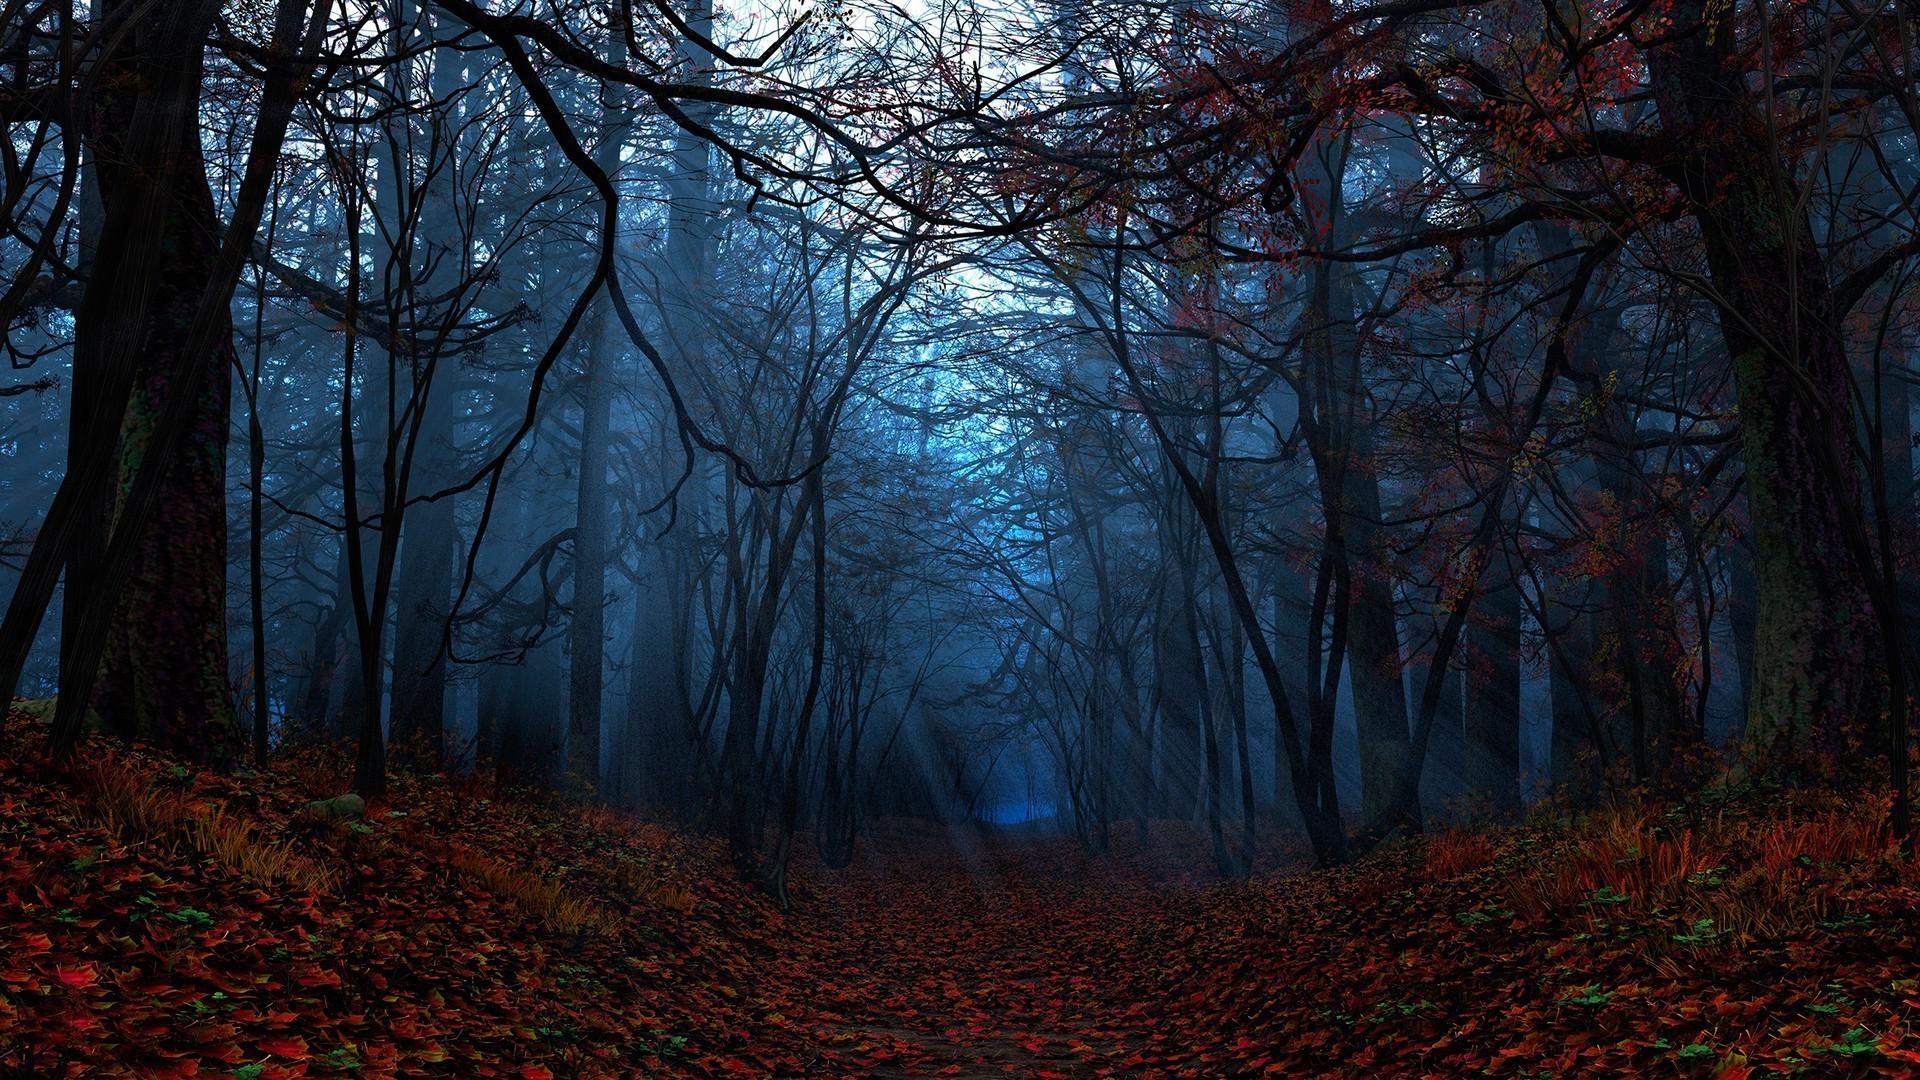 Path through the autumn forest wallpaper #14962